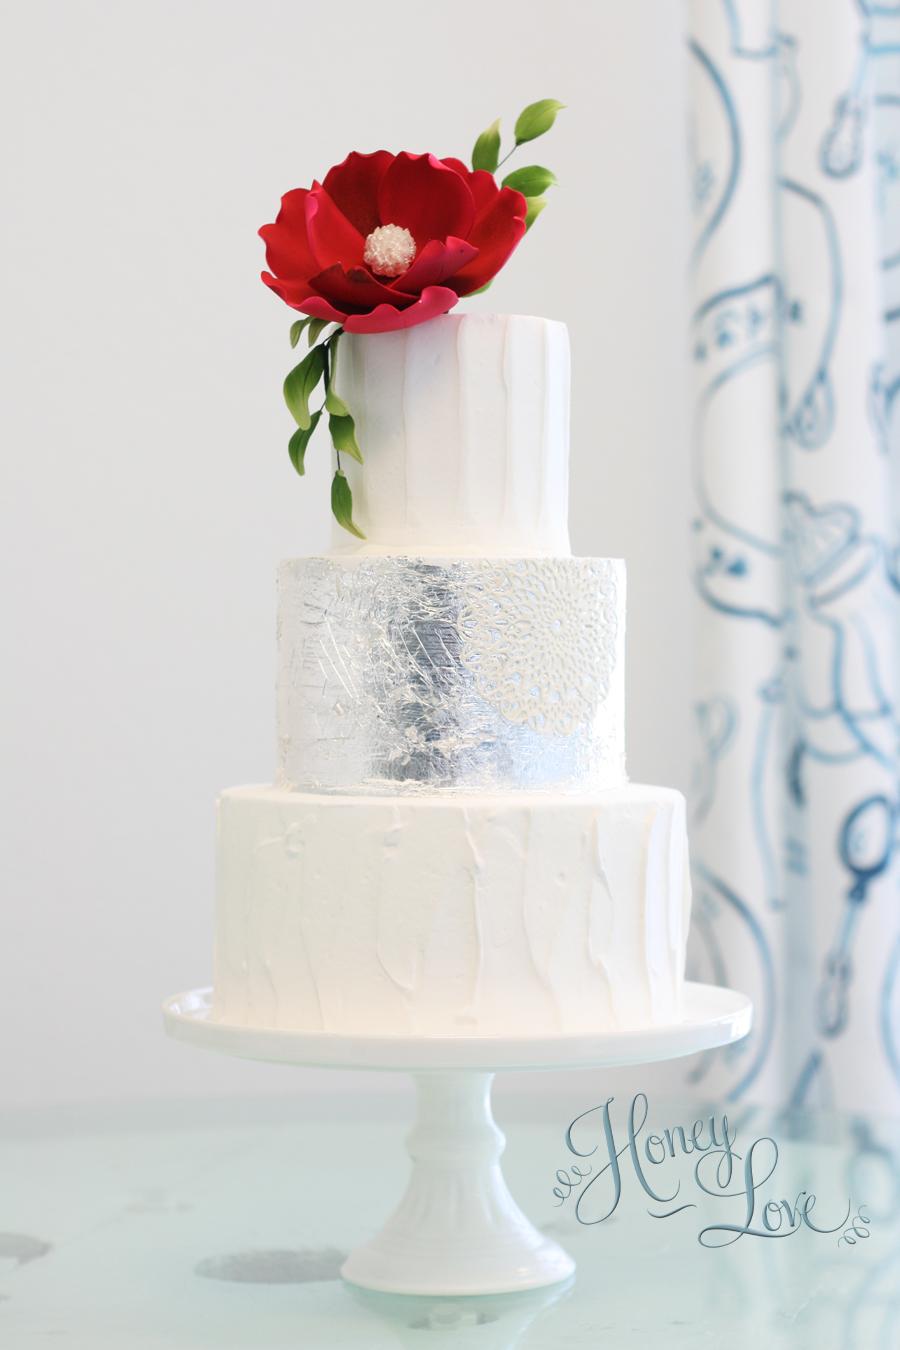 Wedding Cake Gallery — HoneyLove Cakery